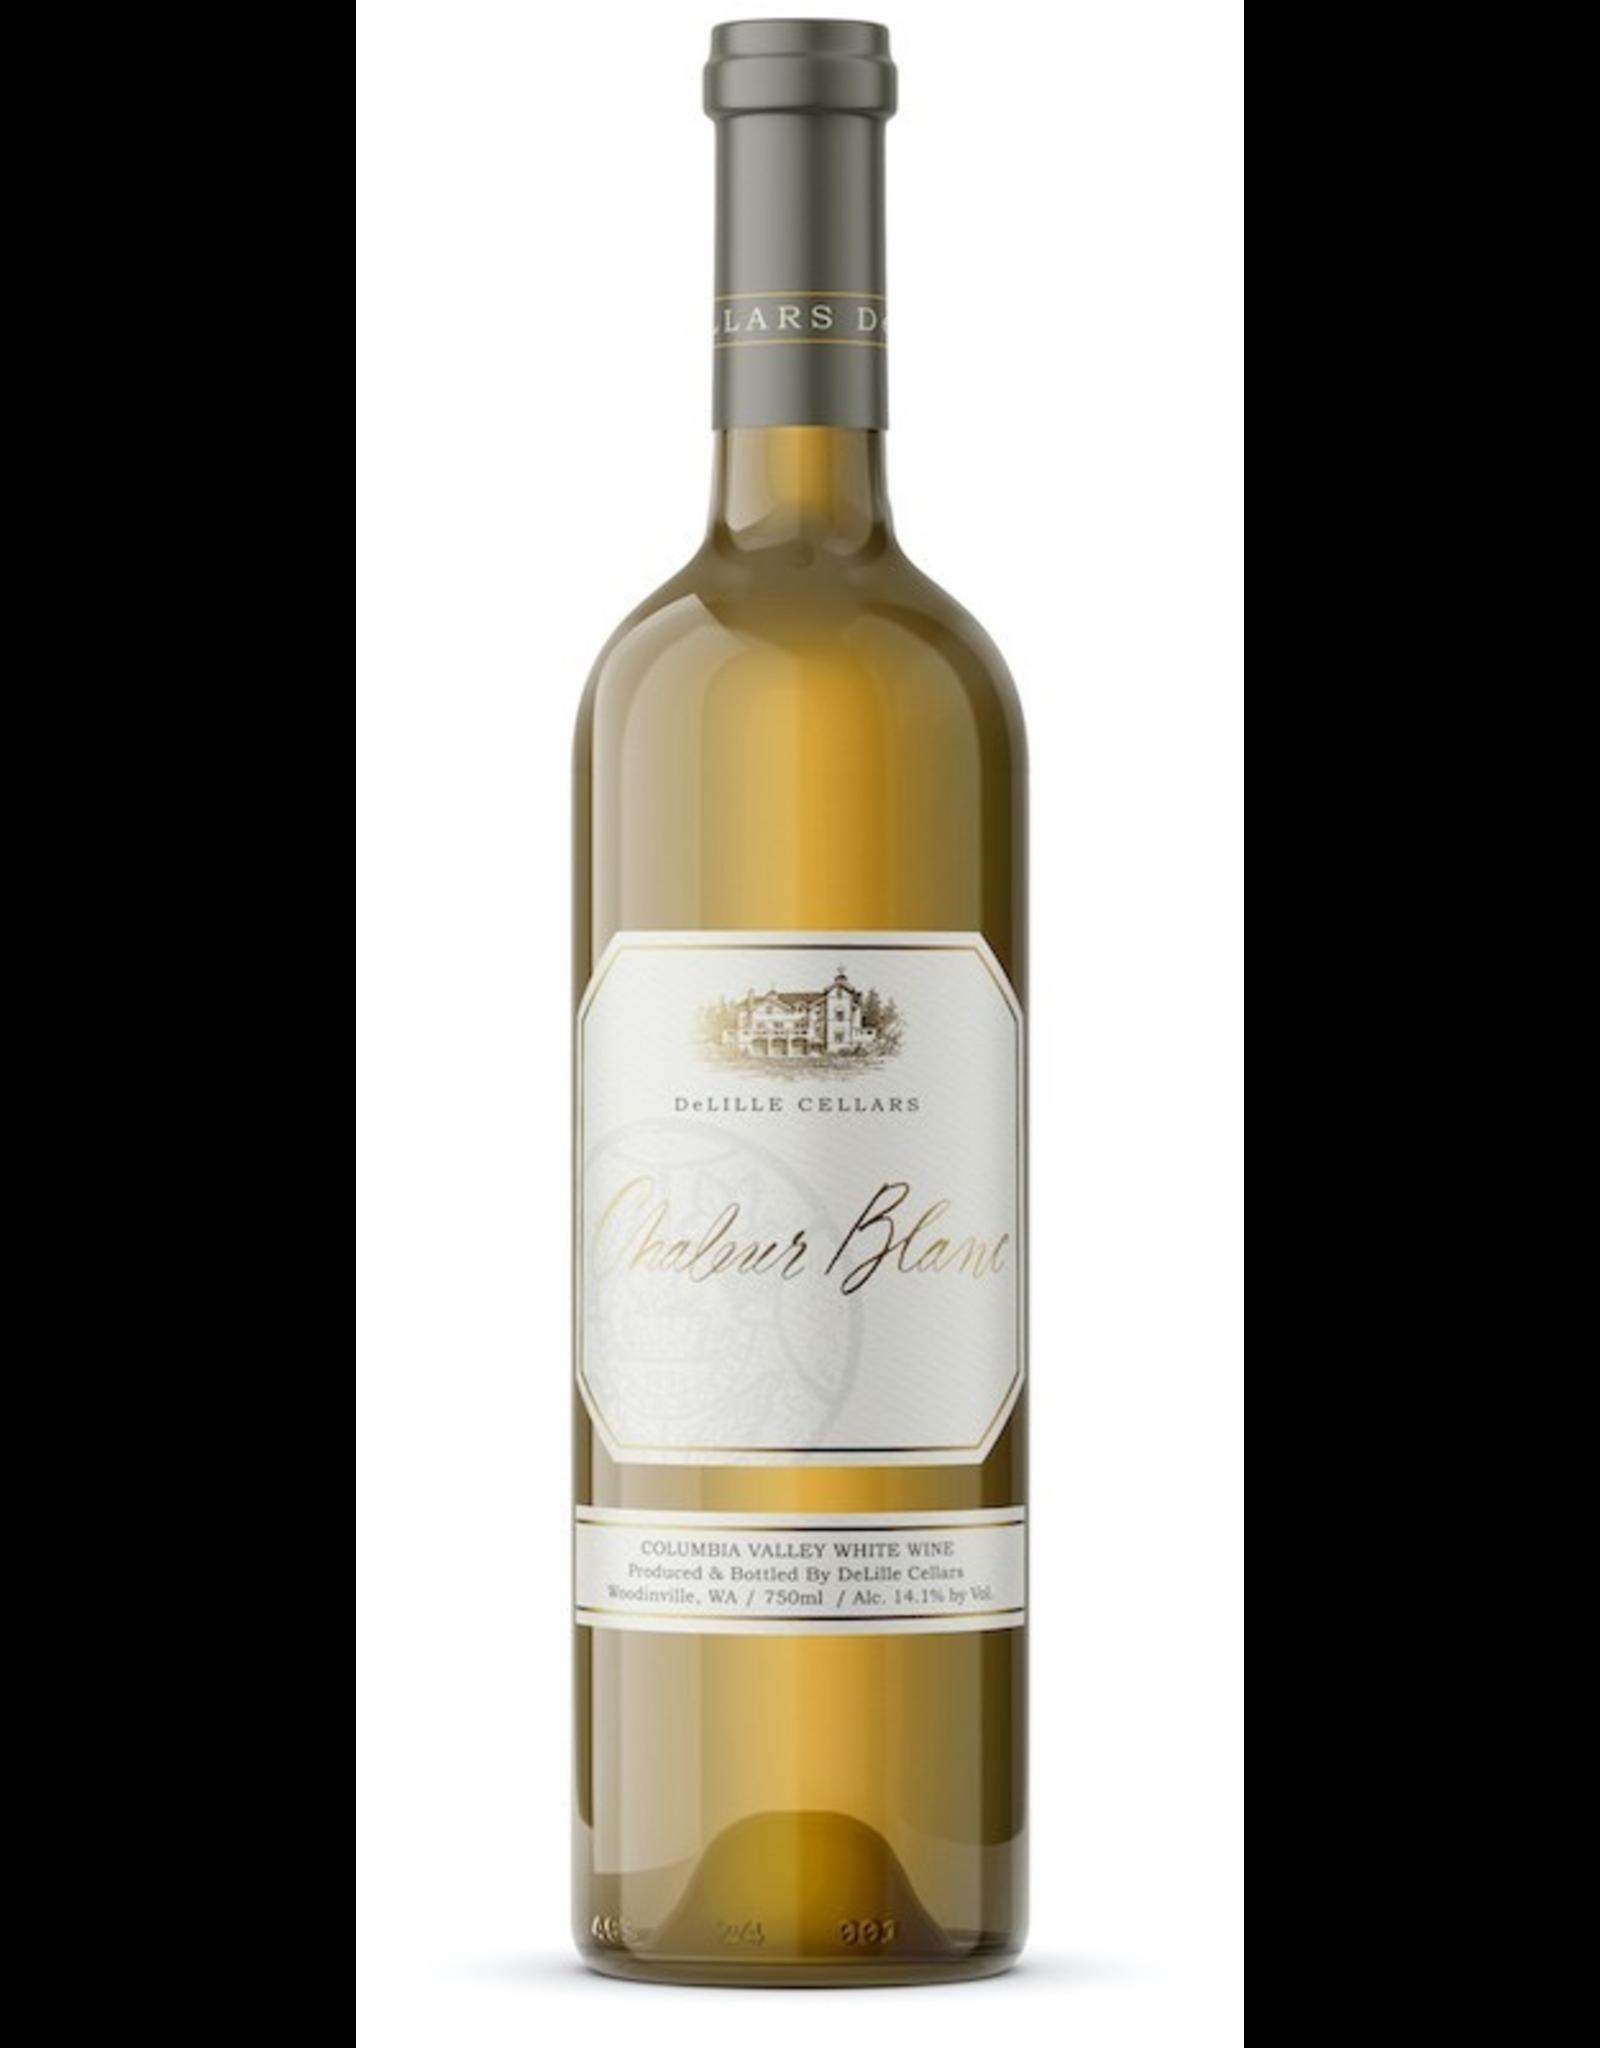 White Wine 2017, De Lille Cellars Chaleur Estate Blanc, White Blend Sauvignon Blanc Semillion, Red Mountain Yakima Valley, Columbia Valley, Washington, 14.4% Alc, CT93 V93